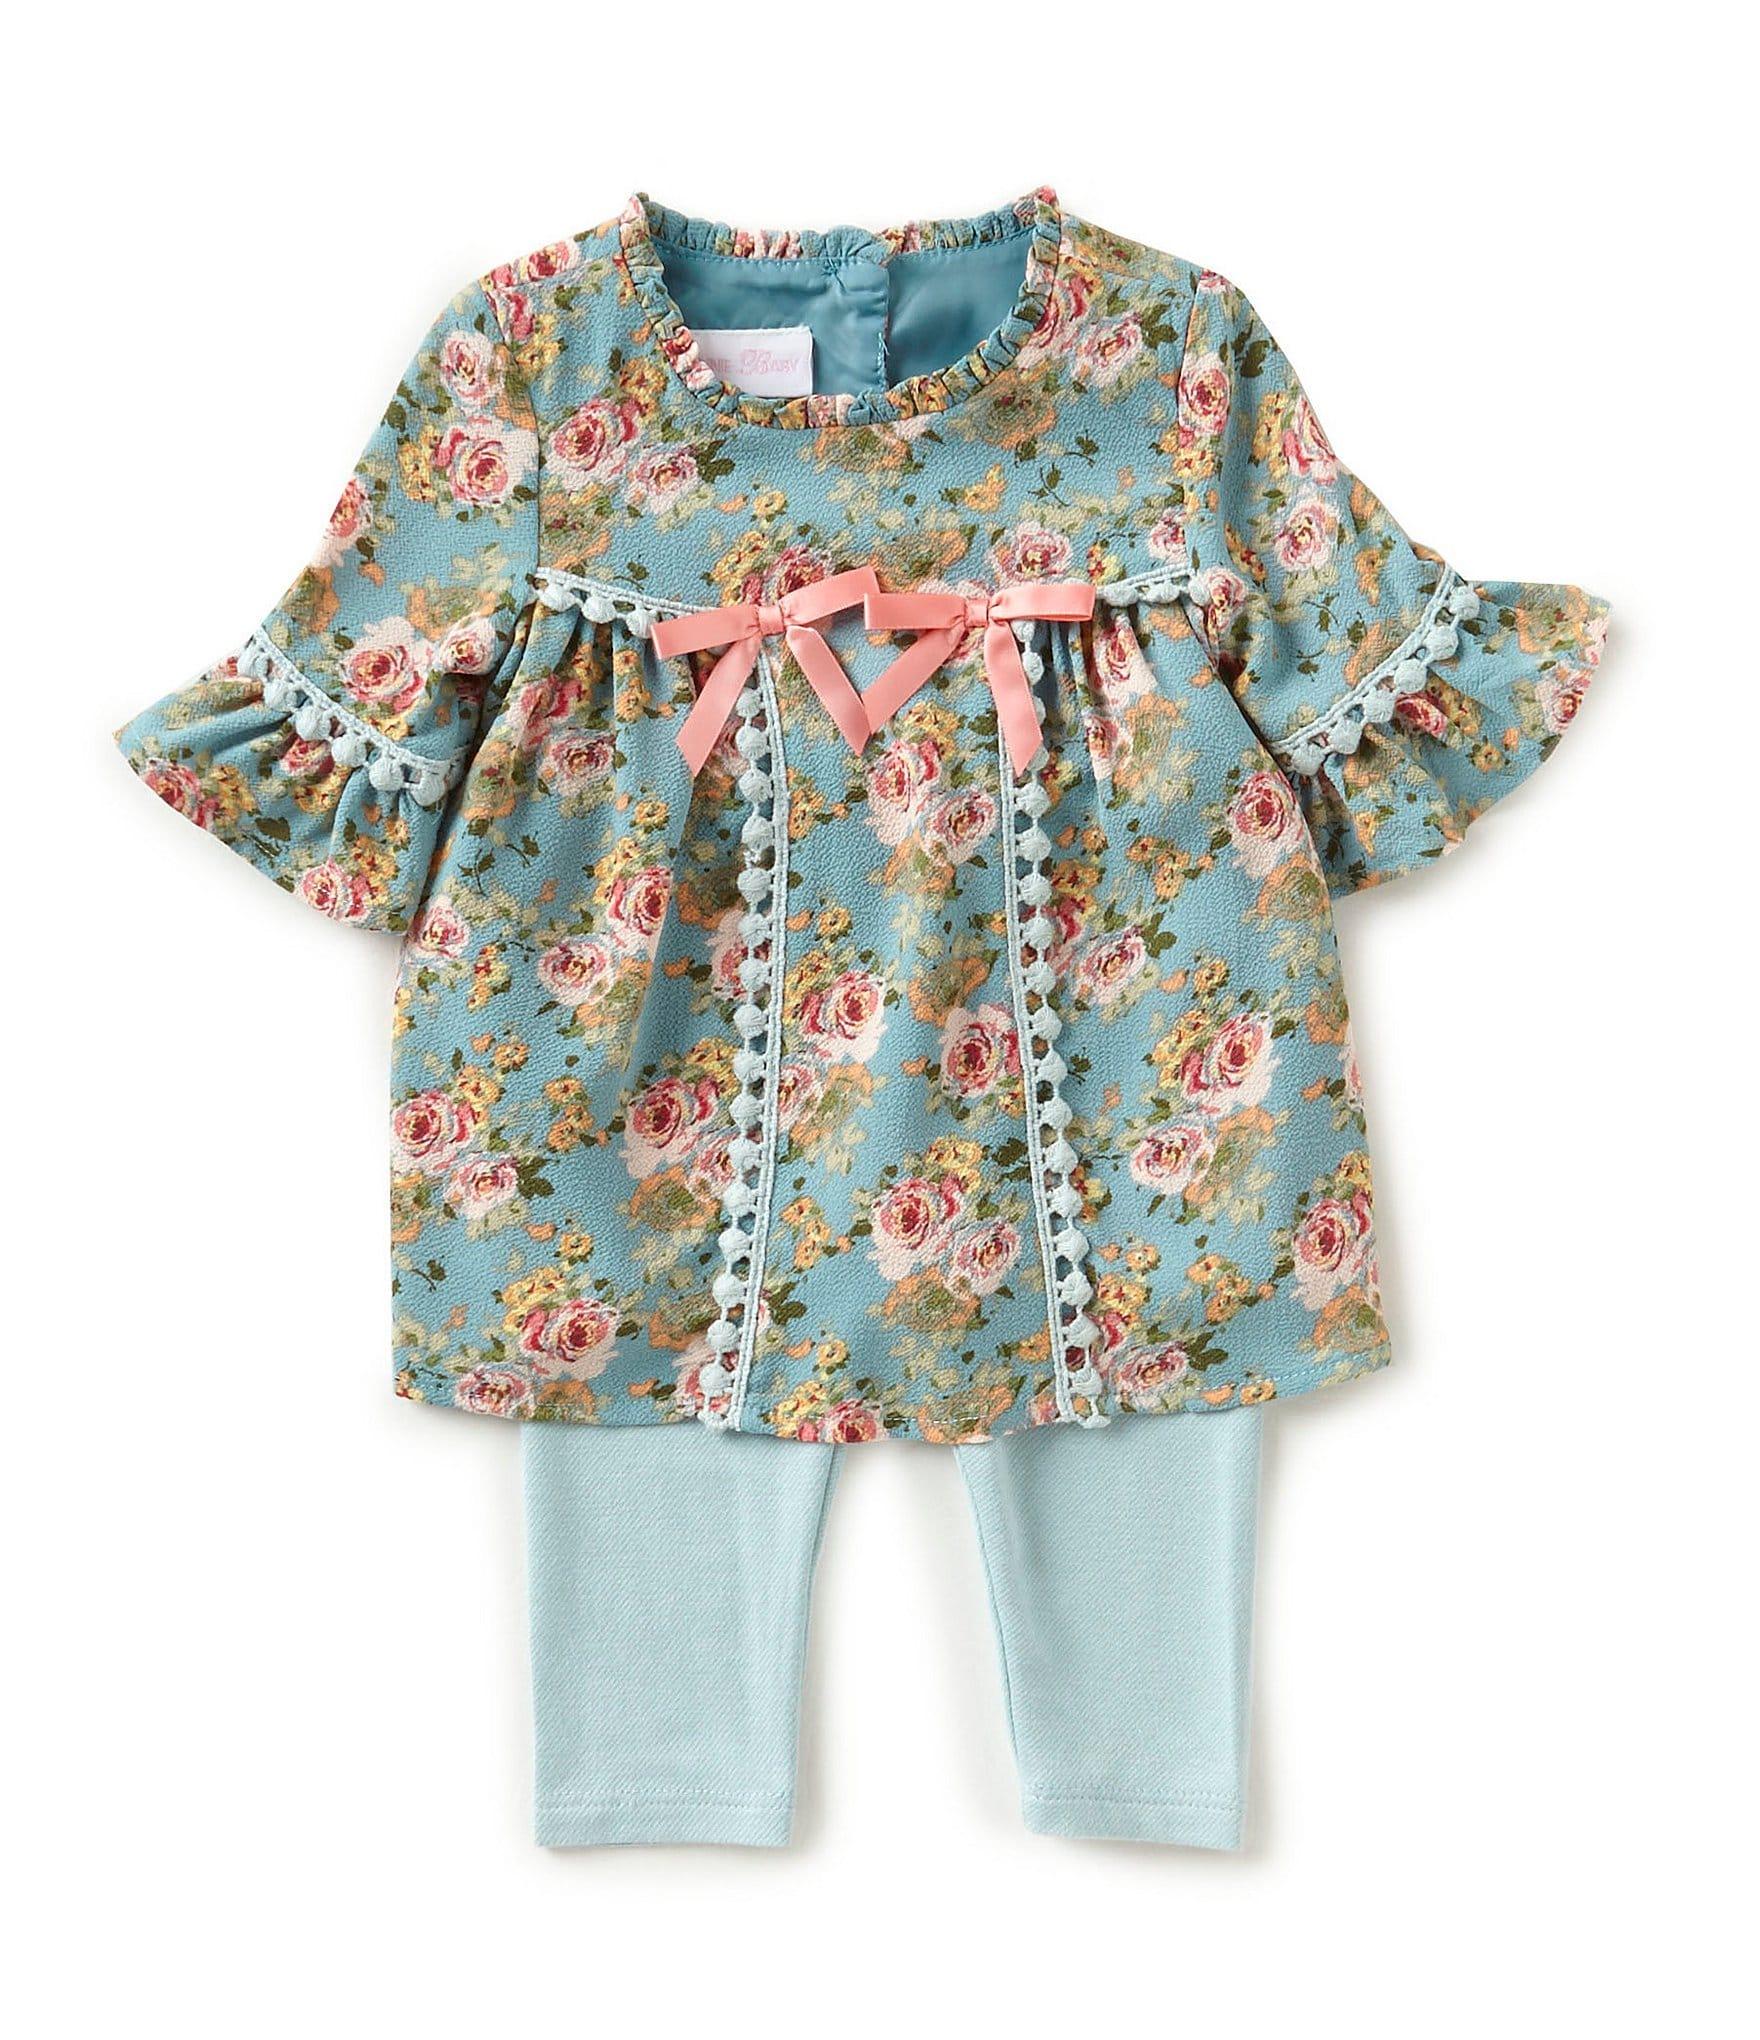 Bonnie Baby Baby Girls Newborn 24 Months Floral Printed A Line Dress Solid Leggings Set Dillards